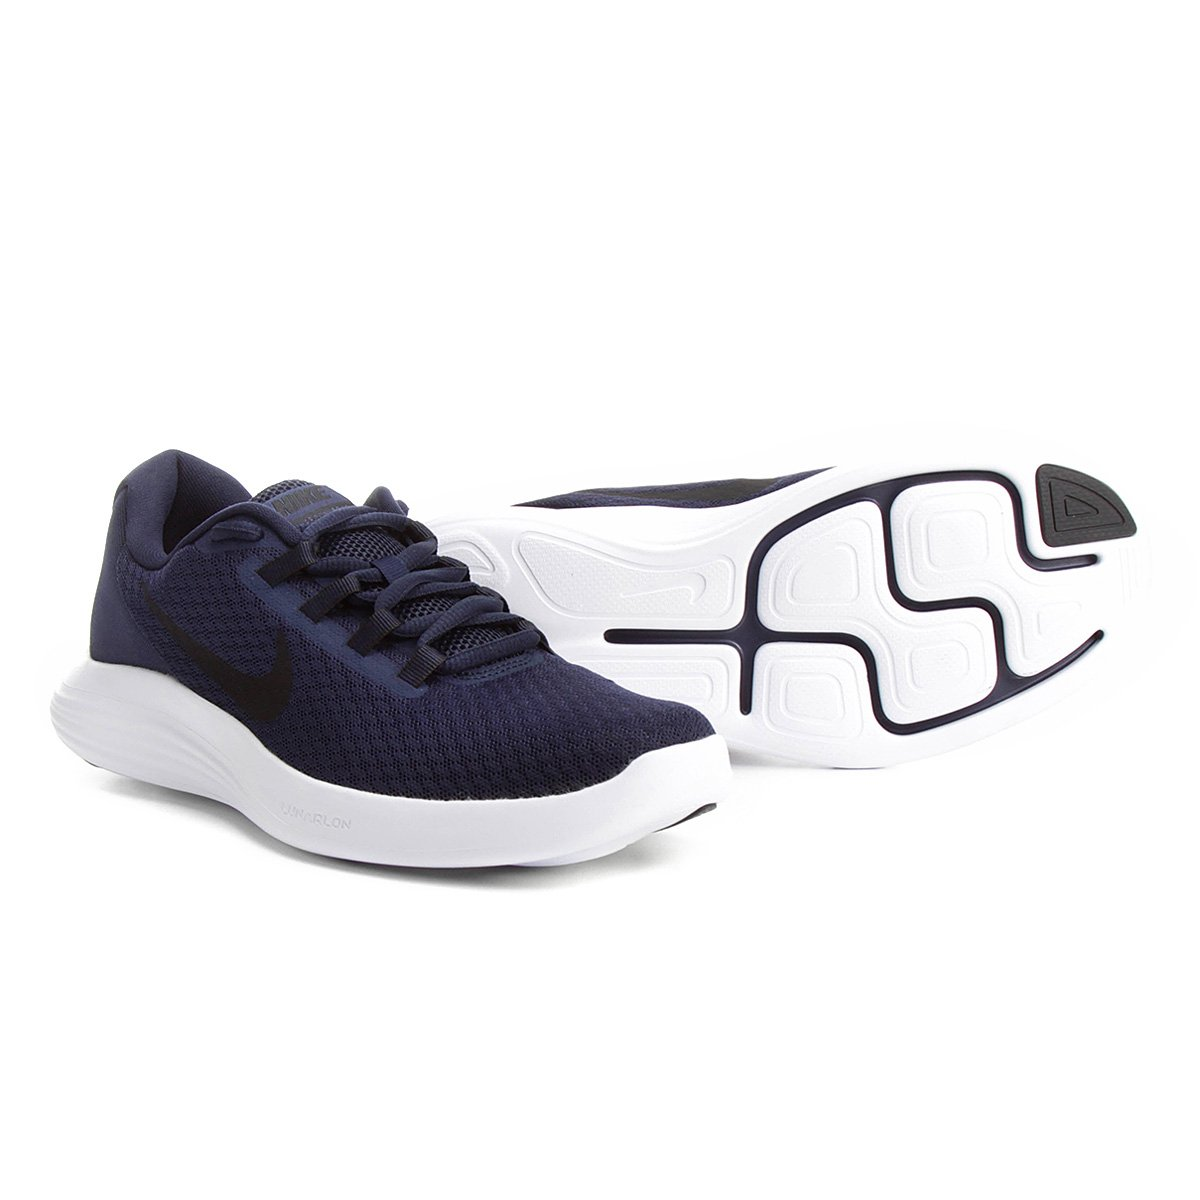 Tênis e Masculino Nike e Lunarconverge Marinho Lunarconverge Masculino Marinho Tênis Preto Nike Preto PqfnREzw